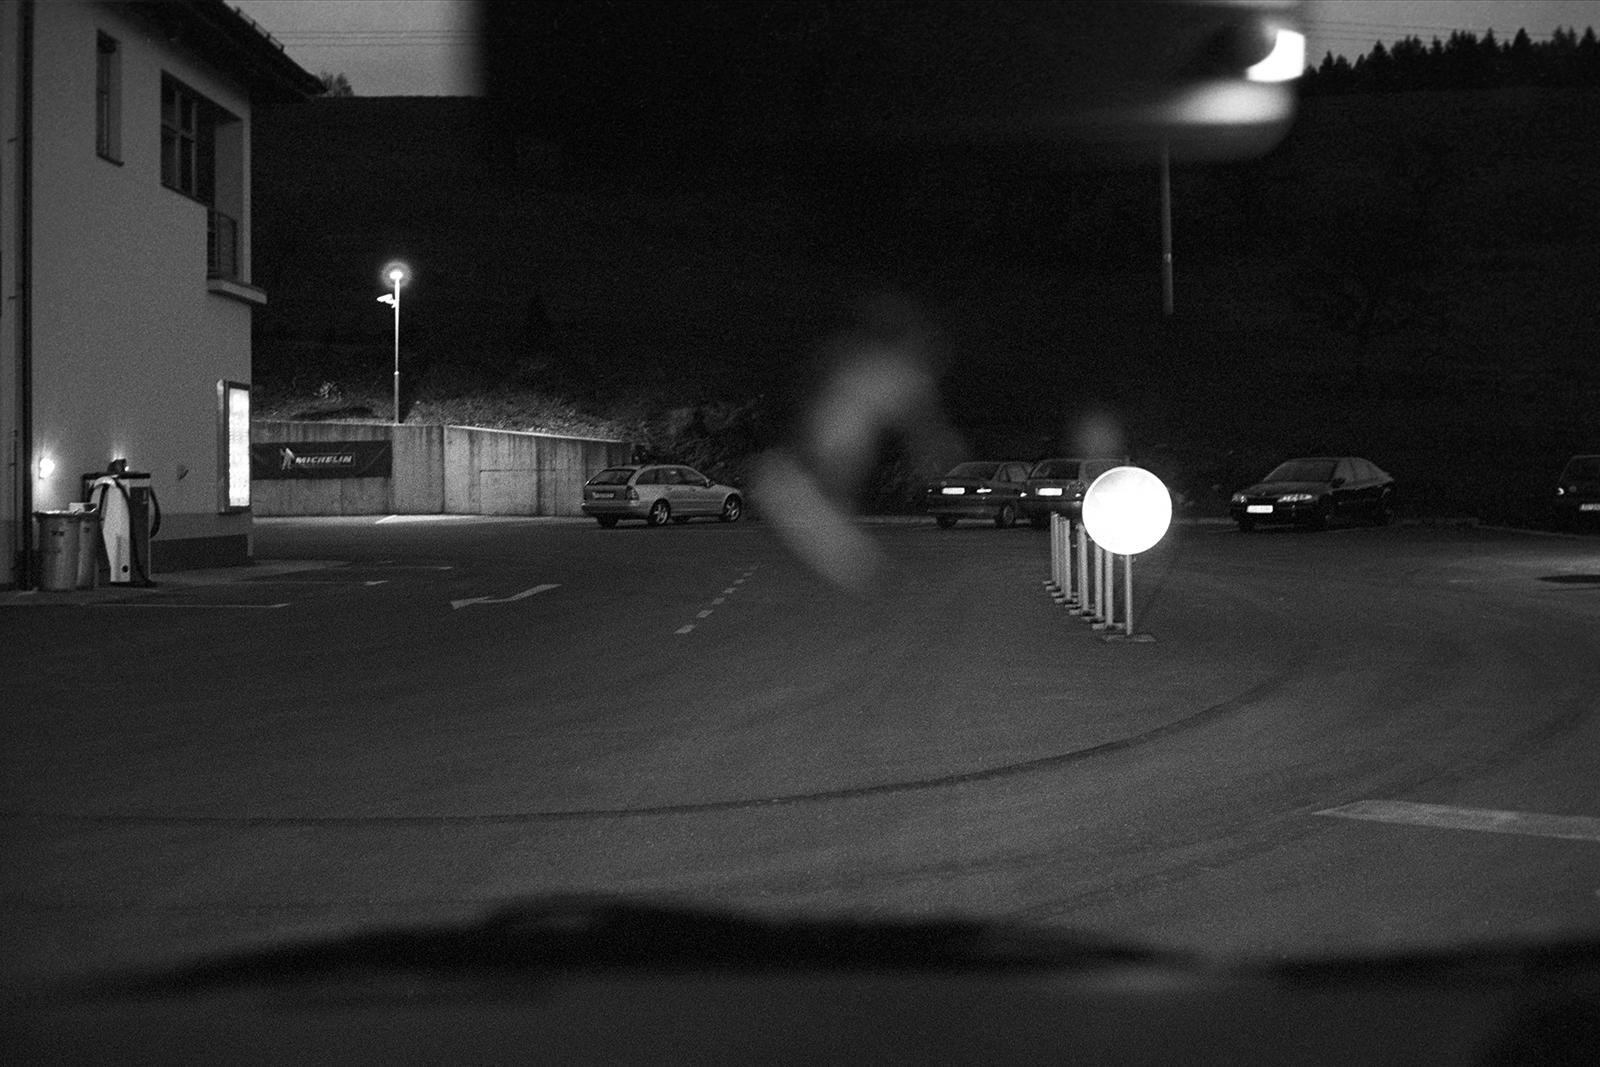 CAR_Checkpoints_07.jpg